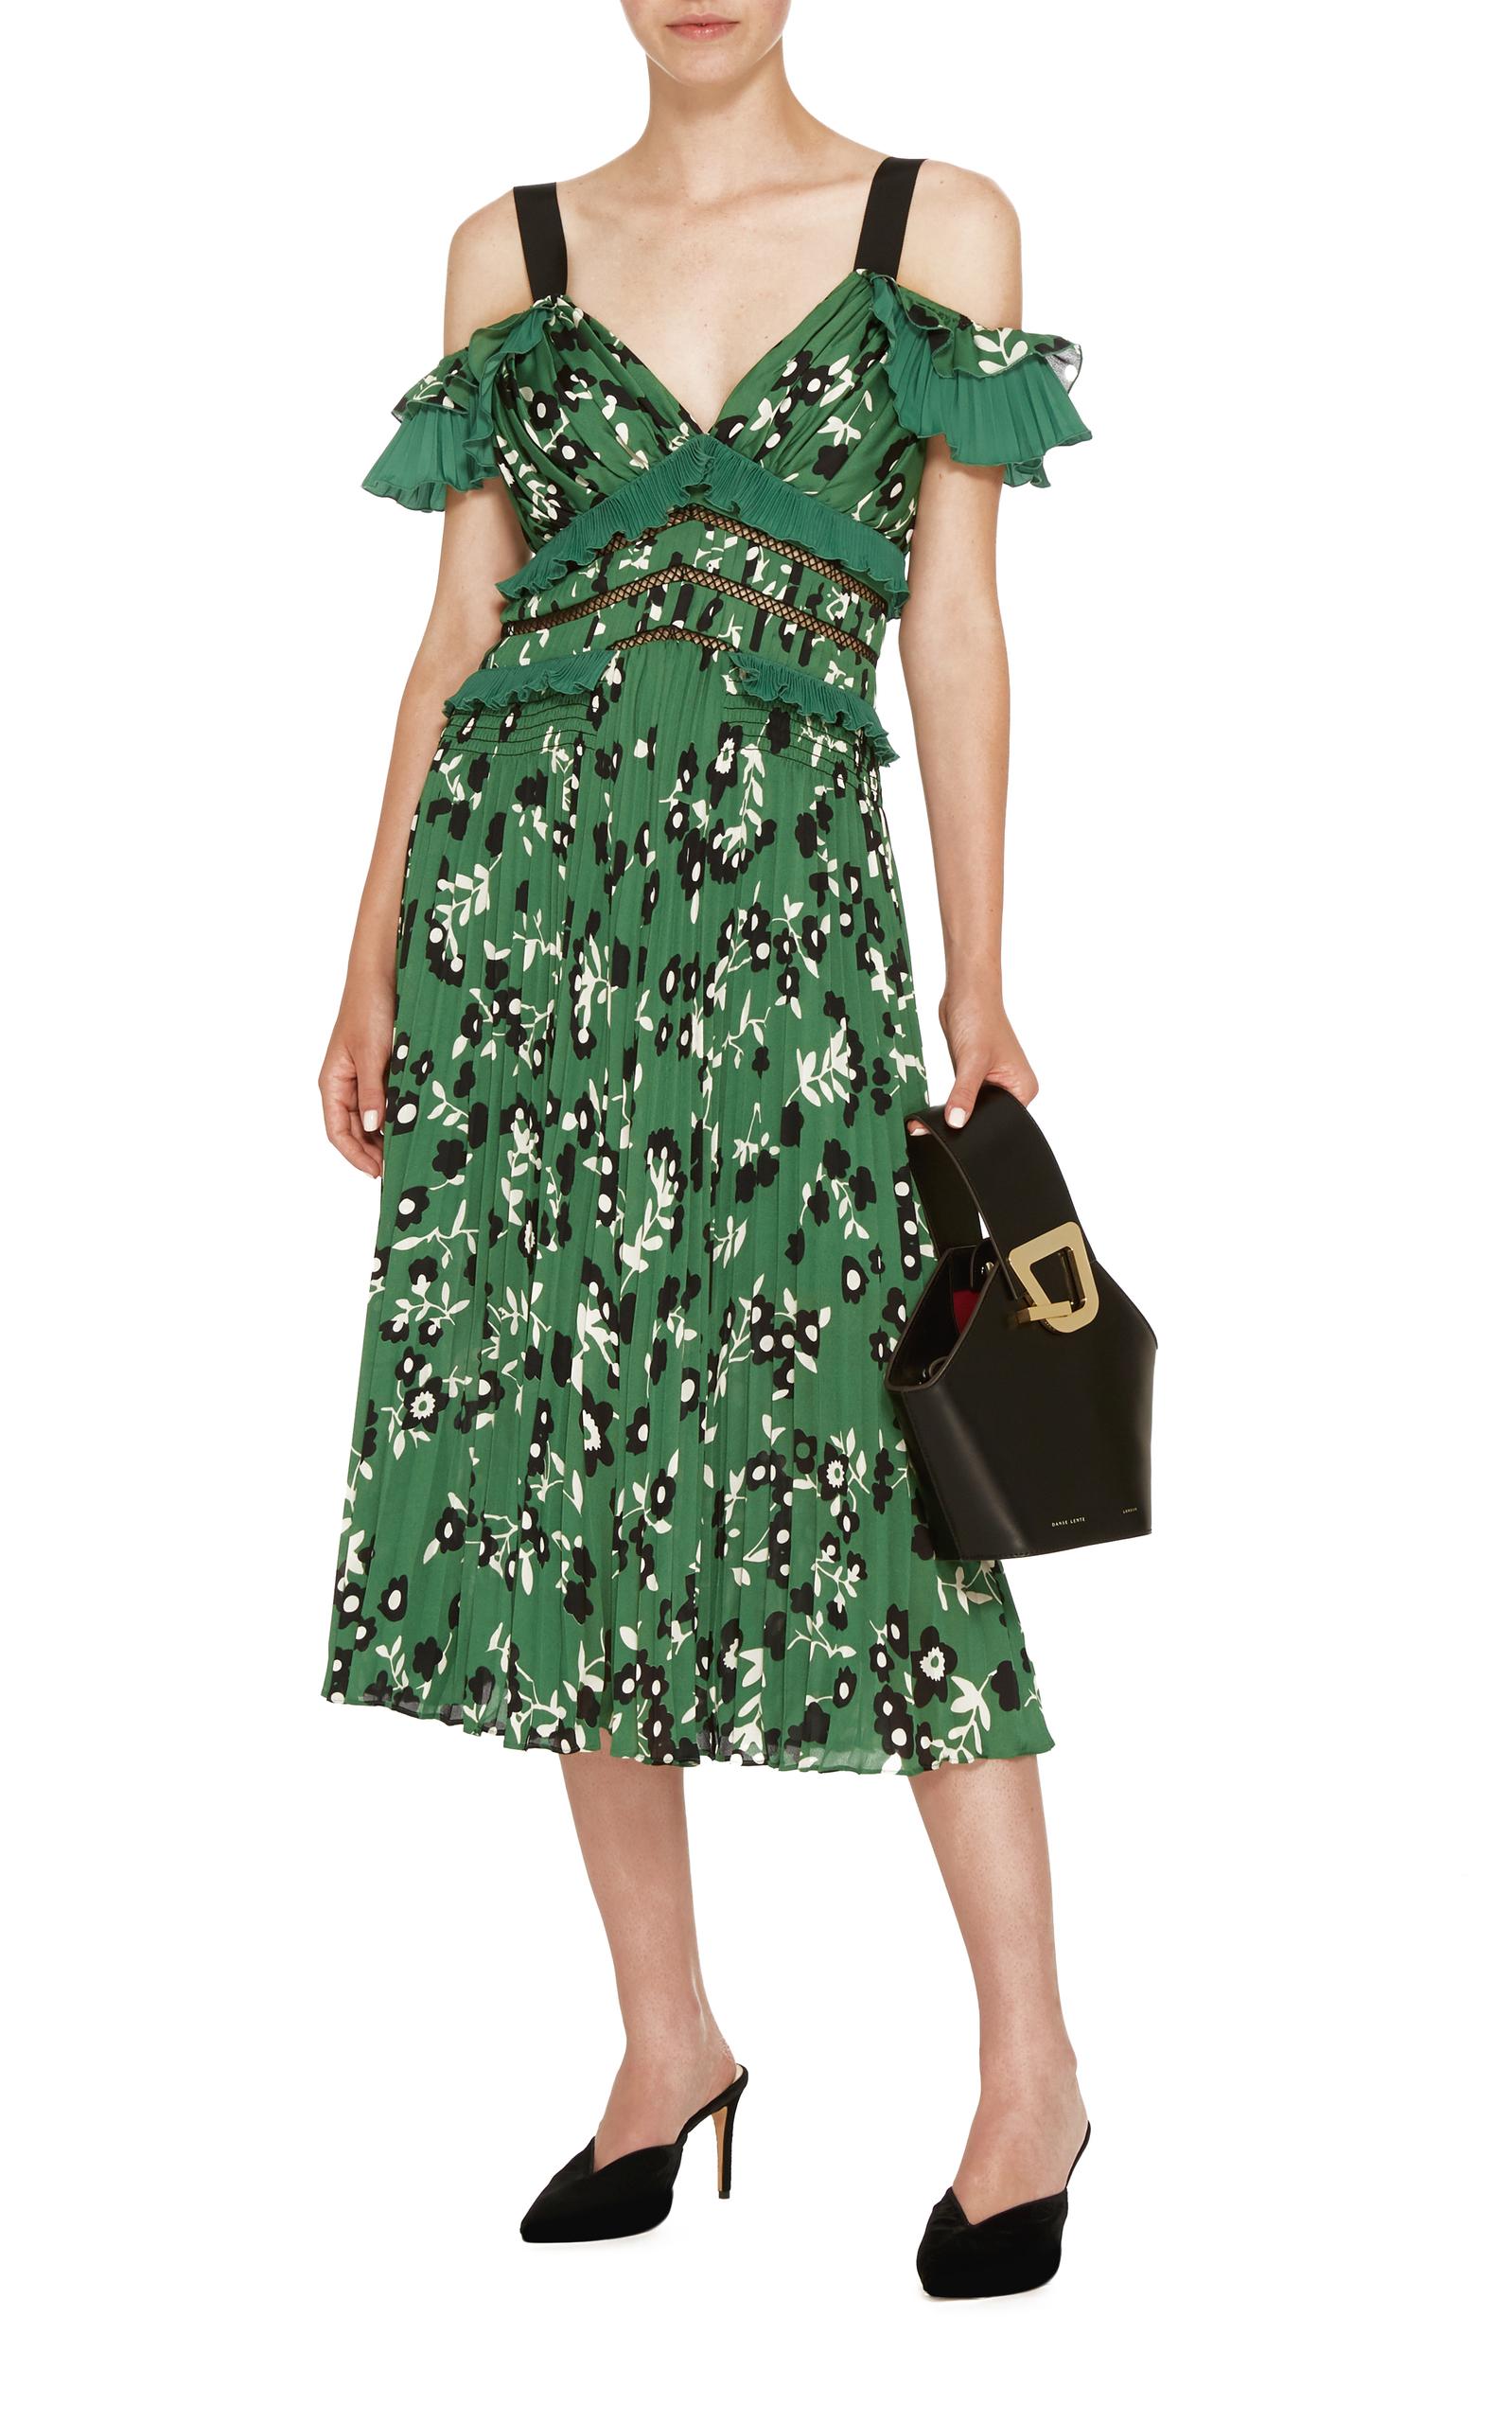 ab16af0c1f264 Cold Shoulder Floral Printed Midi Dress by Self Portrait | Moda Operandi